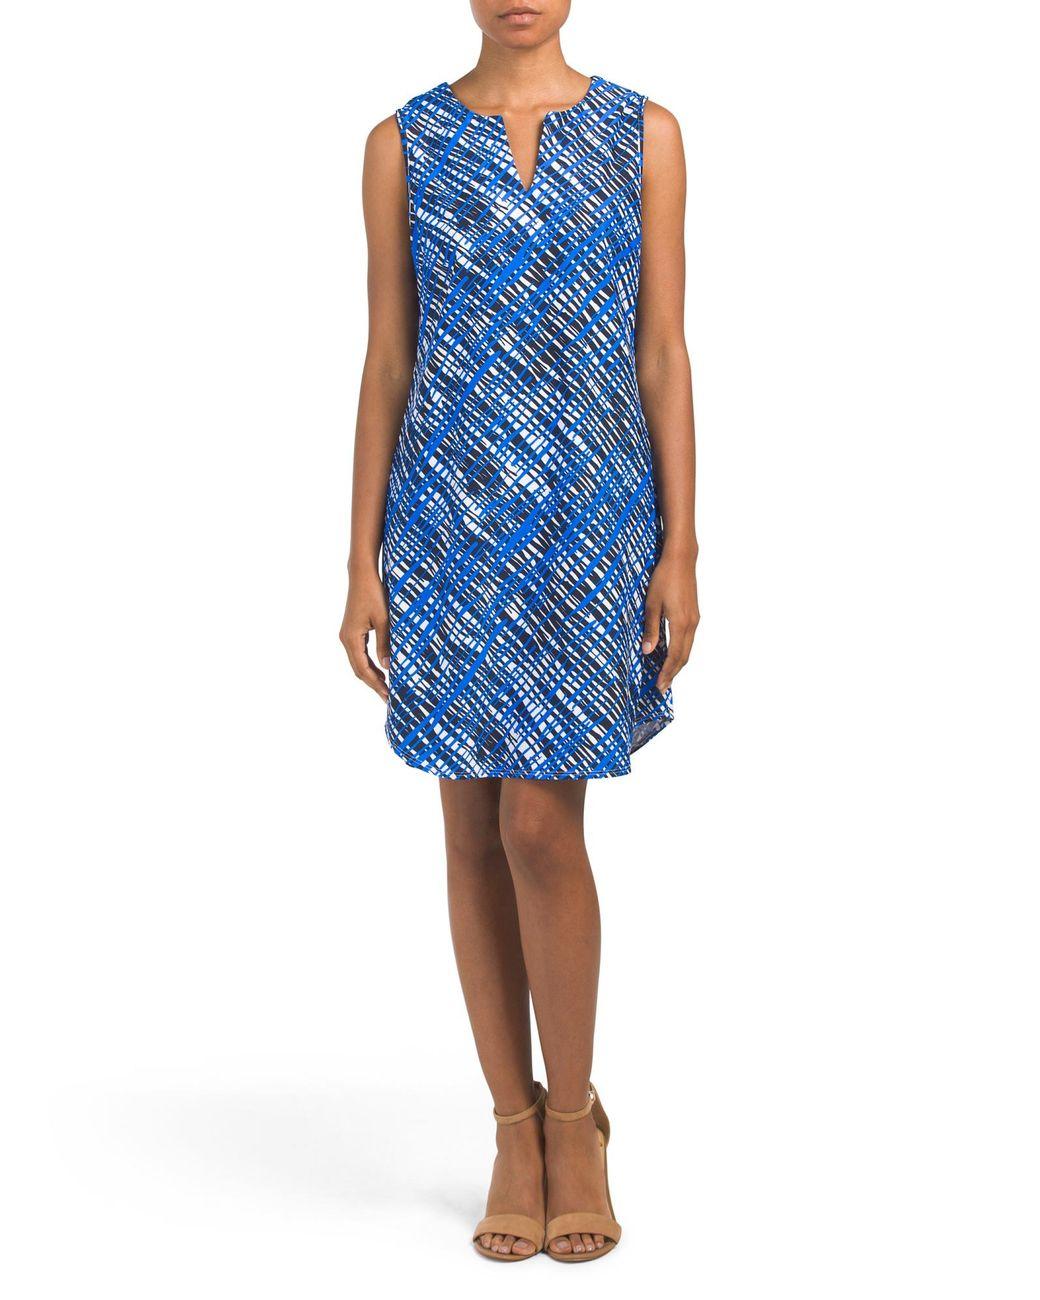 664ce78a20f8 Tj Maxx Made In Usa Allison Split Neck Shift Dress in Blue - Lyst